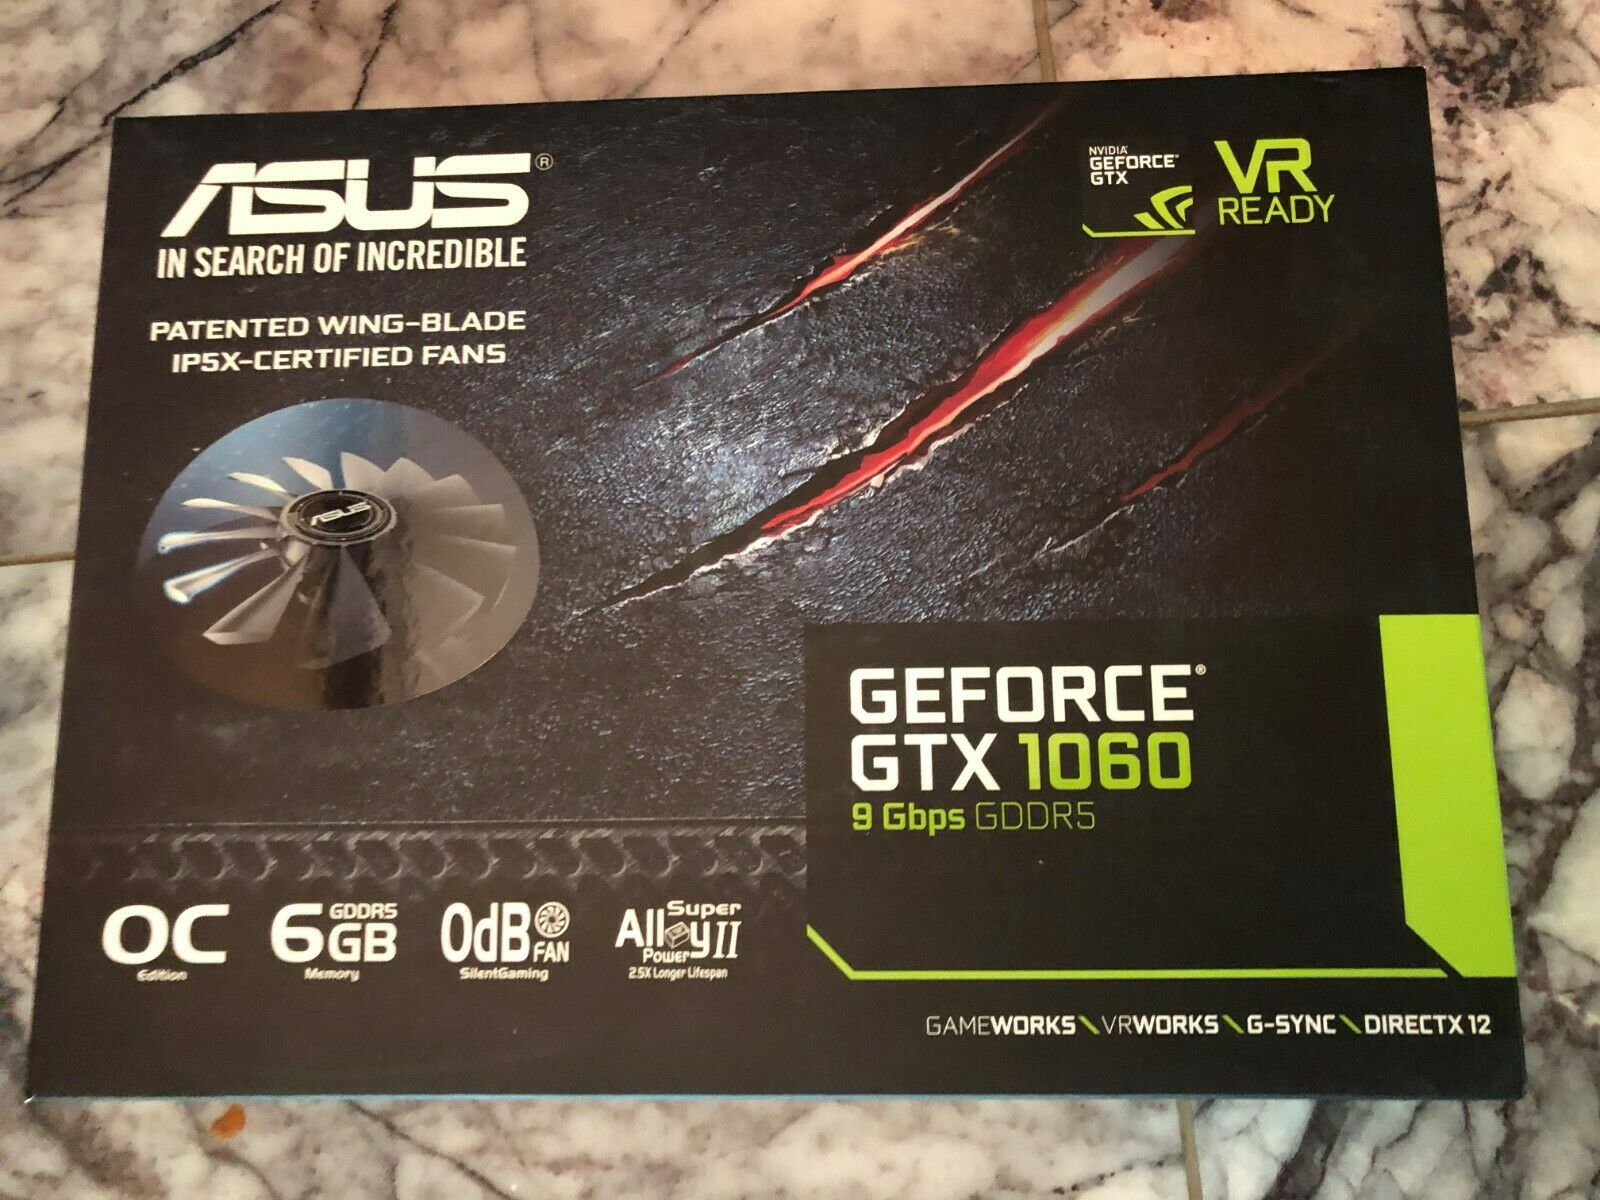 ASUS GeForce GTX 1060 6GB Dual-Fan OO6G GAMING VR Ready